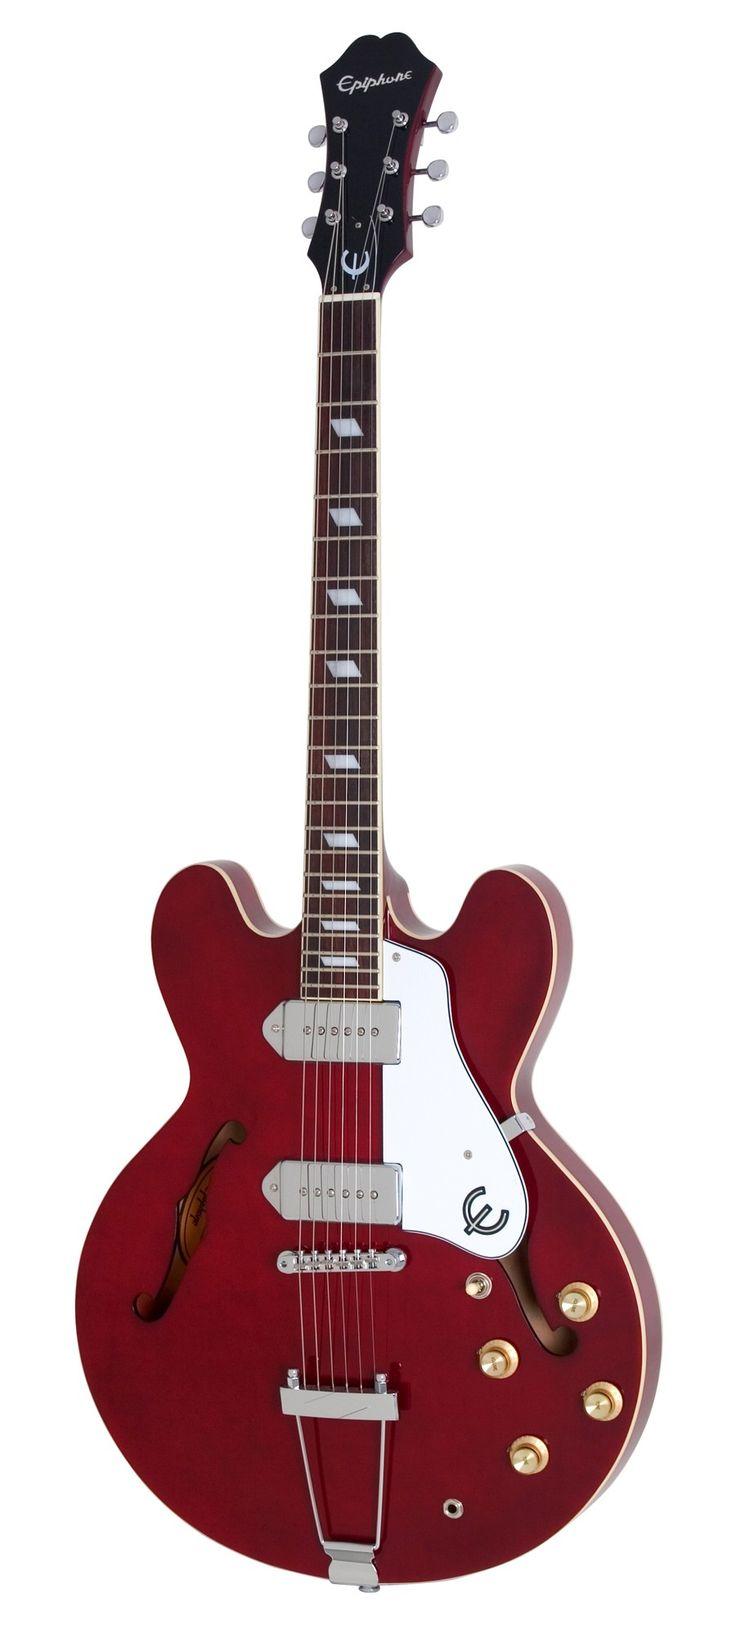 Epiphone Casino Hollowbody Electric Guitar - Cherry